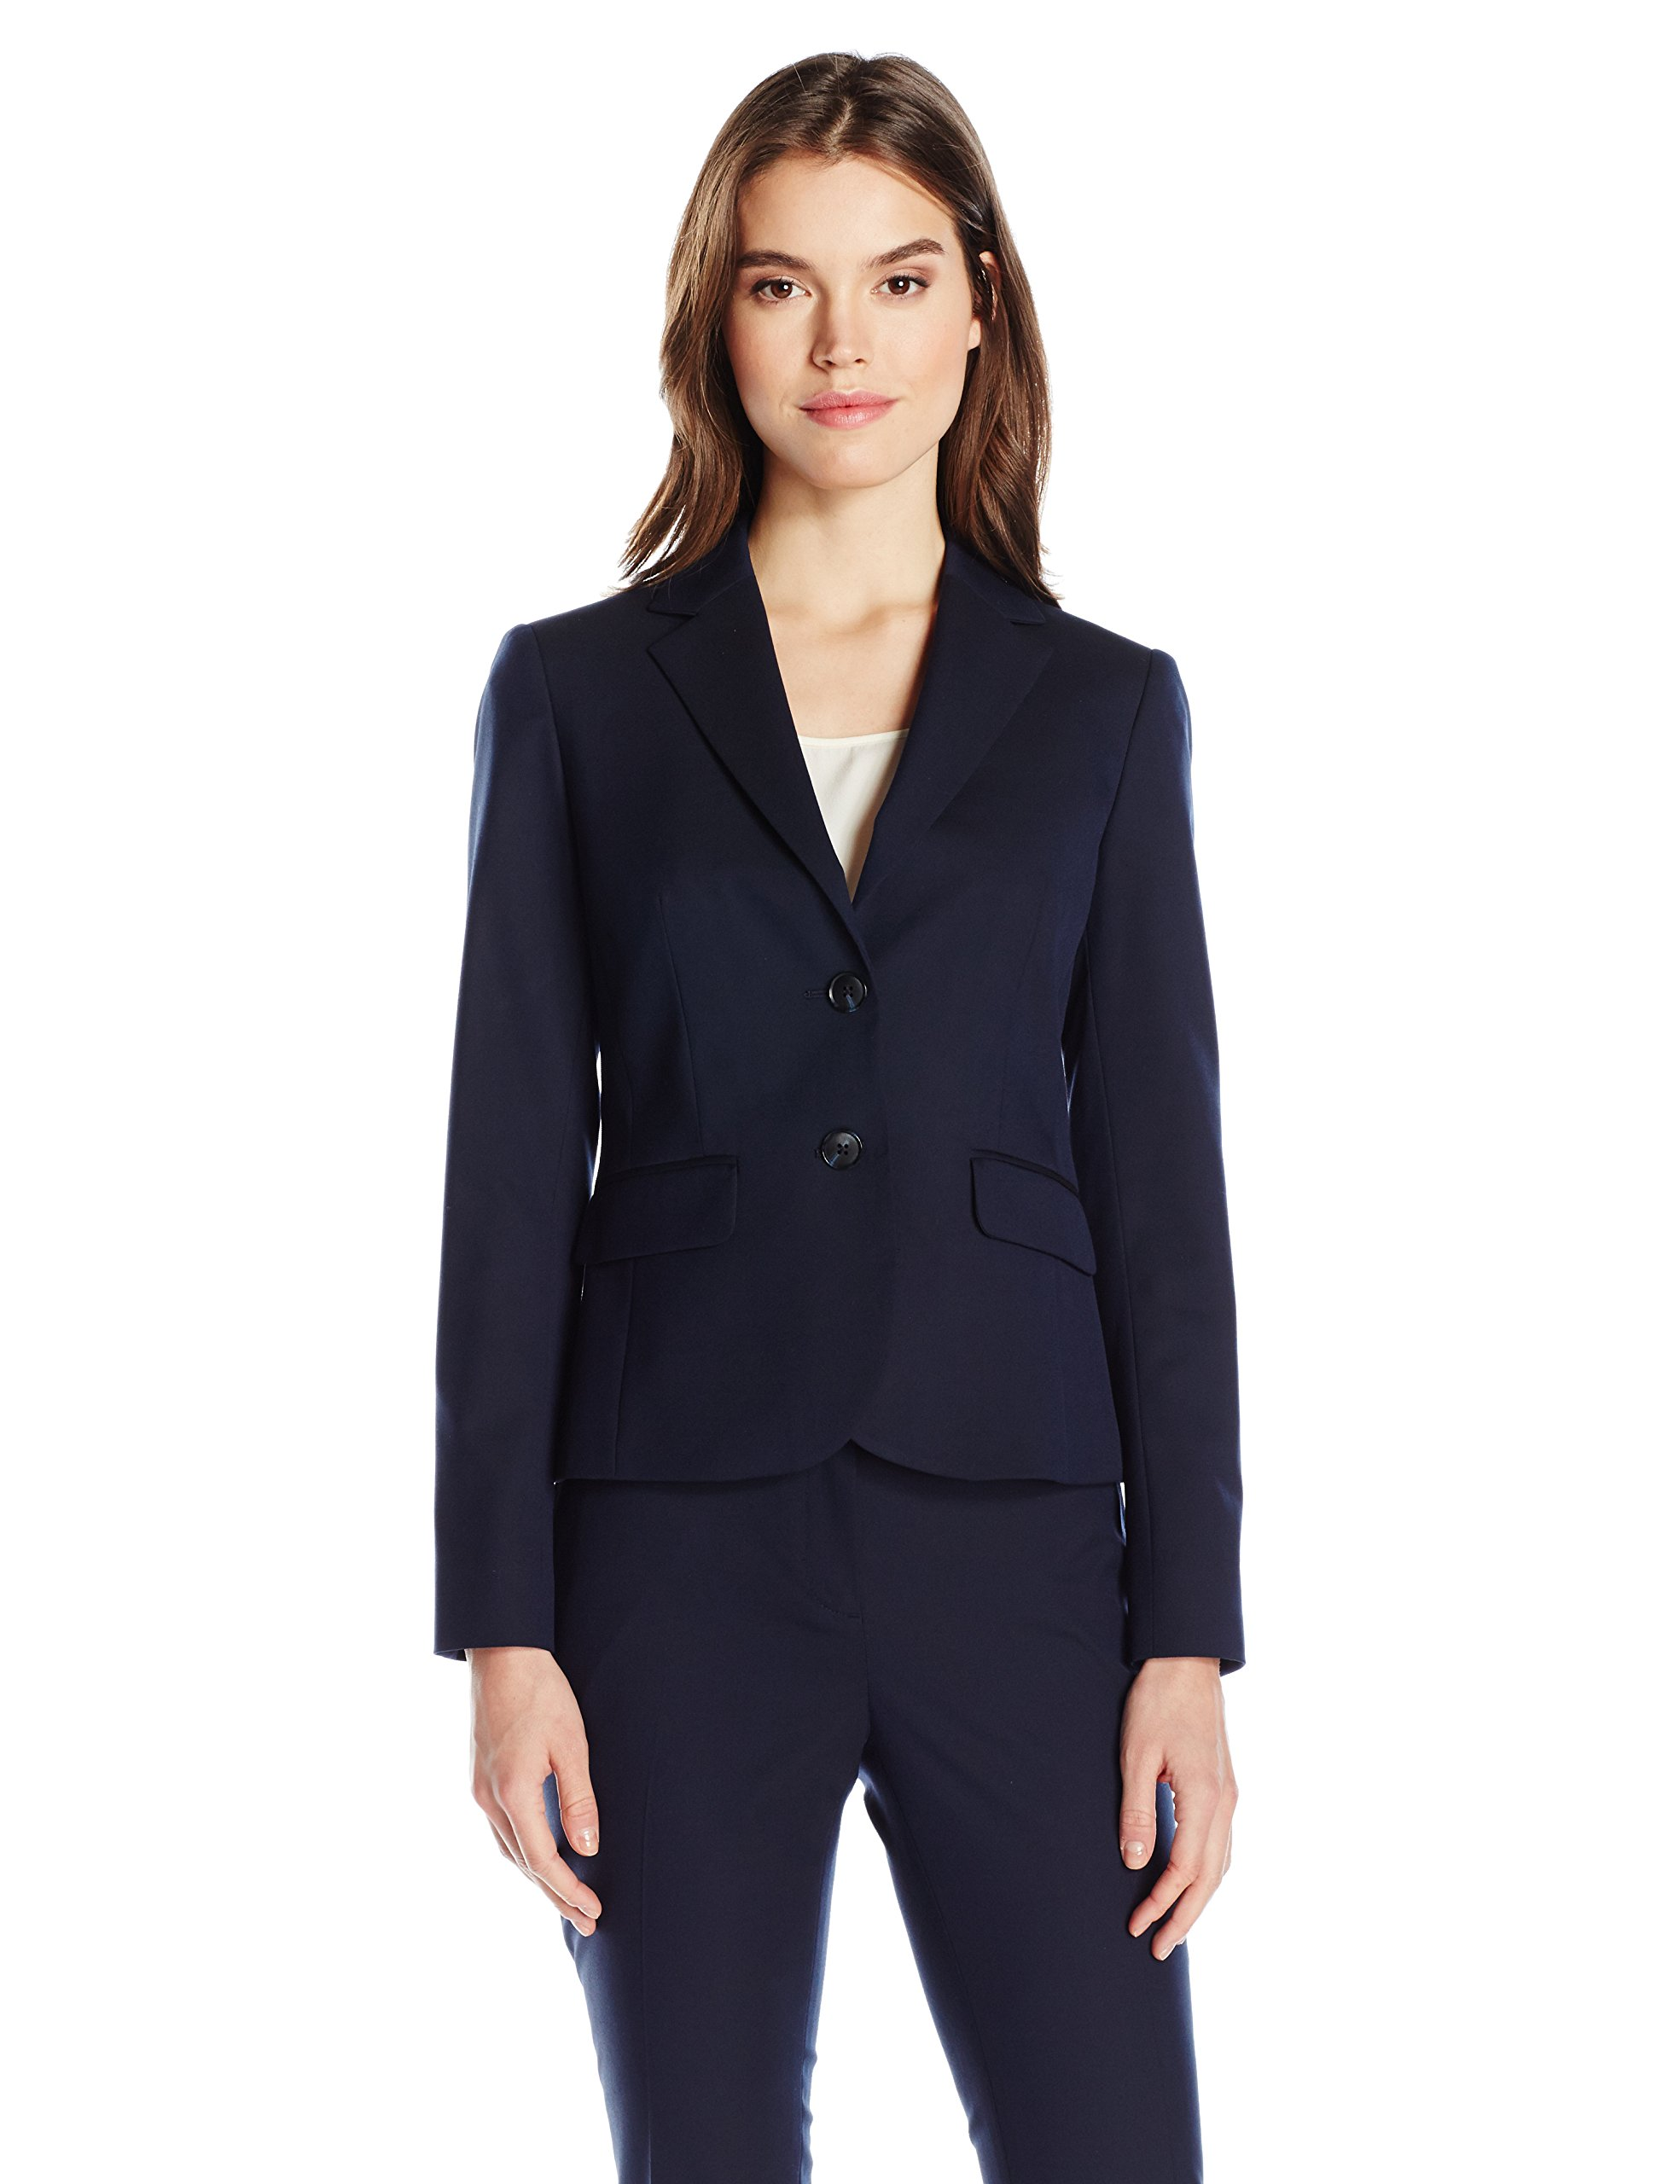 Jones New York Women's Washable Suiting Short 2 Btn Jacket, Navy, 14